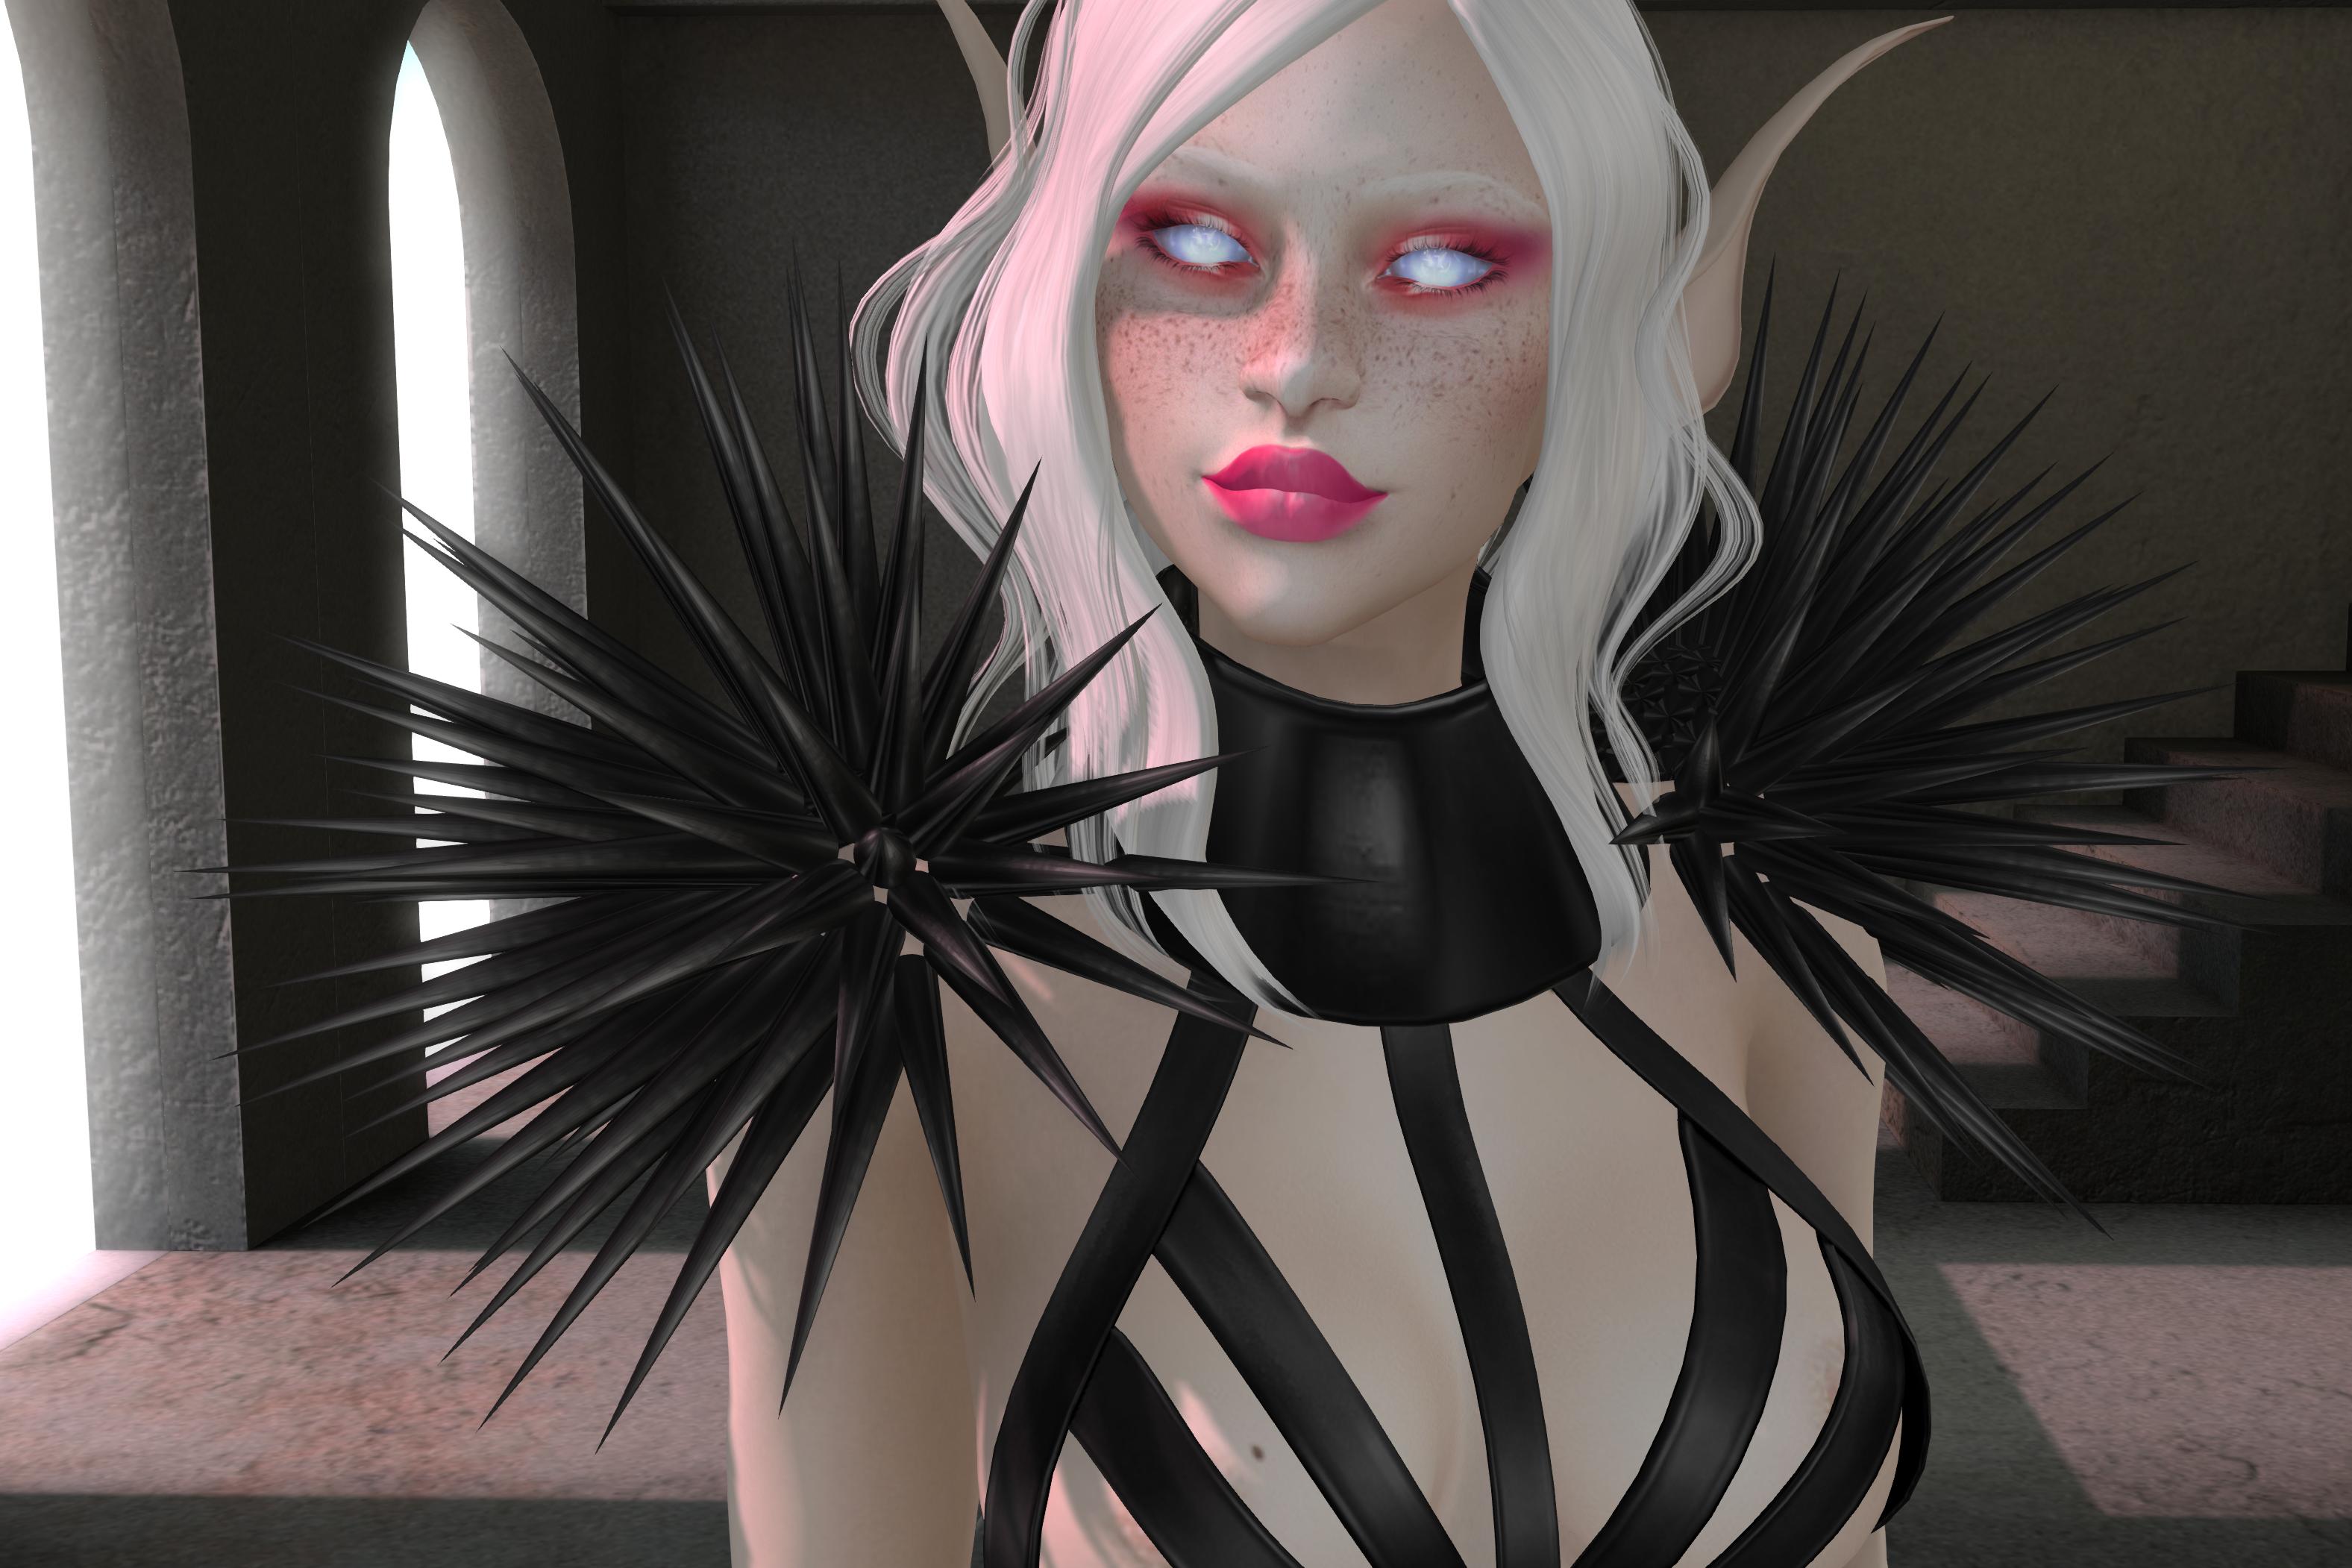 Priestess of Darkness